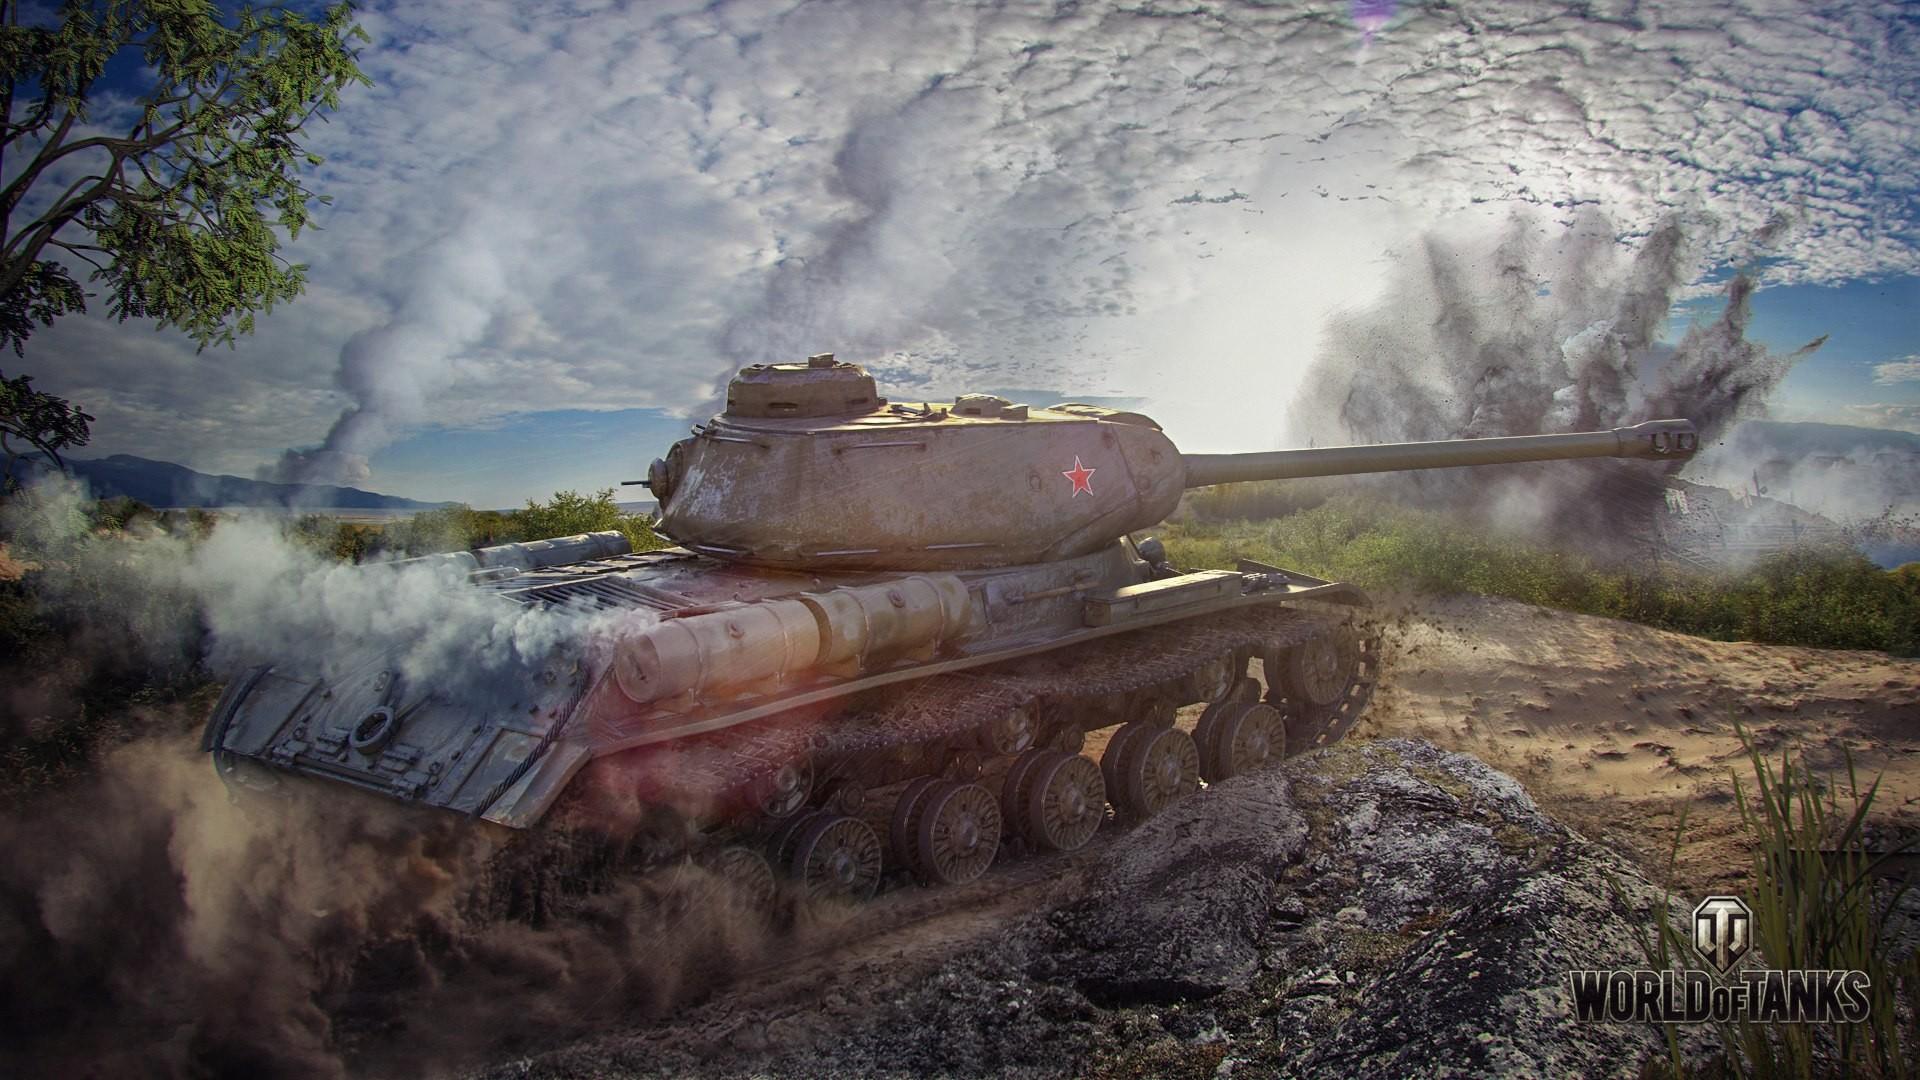 4k Girls Und Panzer Wallpaper World Of Tanks Wargaming Video Games Is 2 Wallpapers Hd